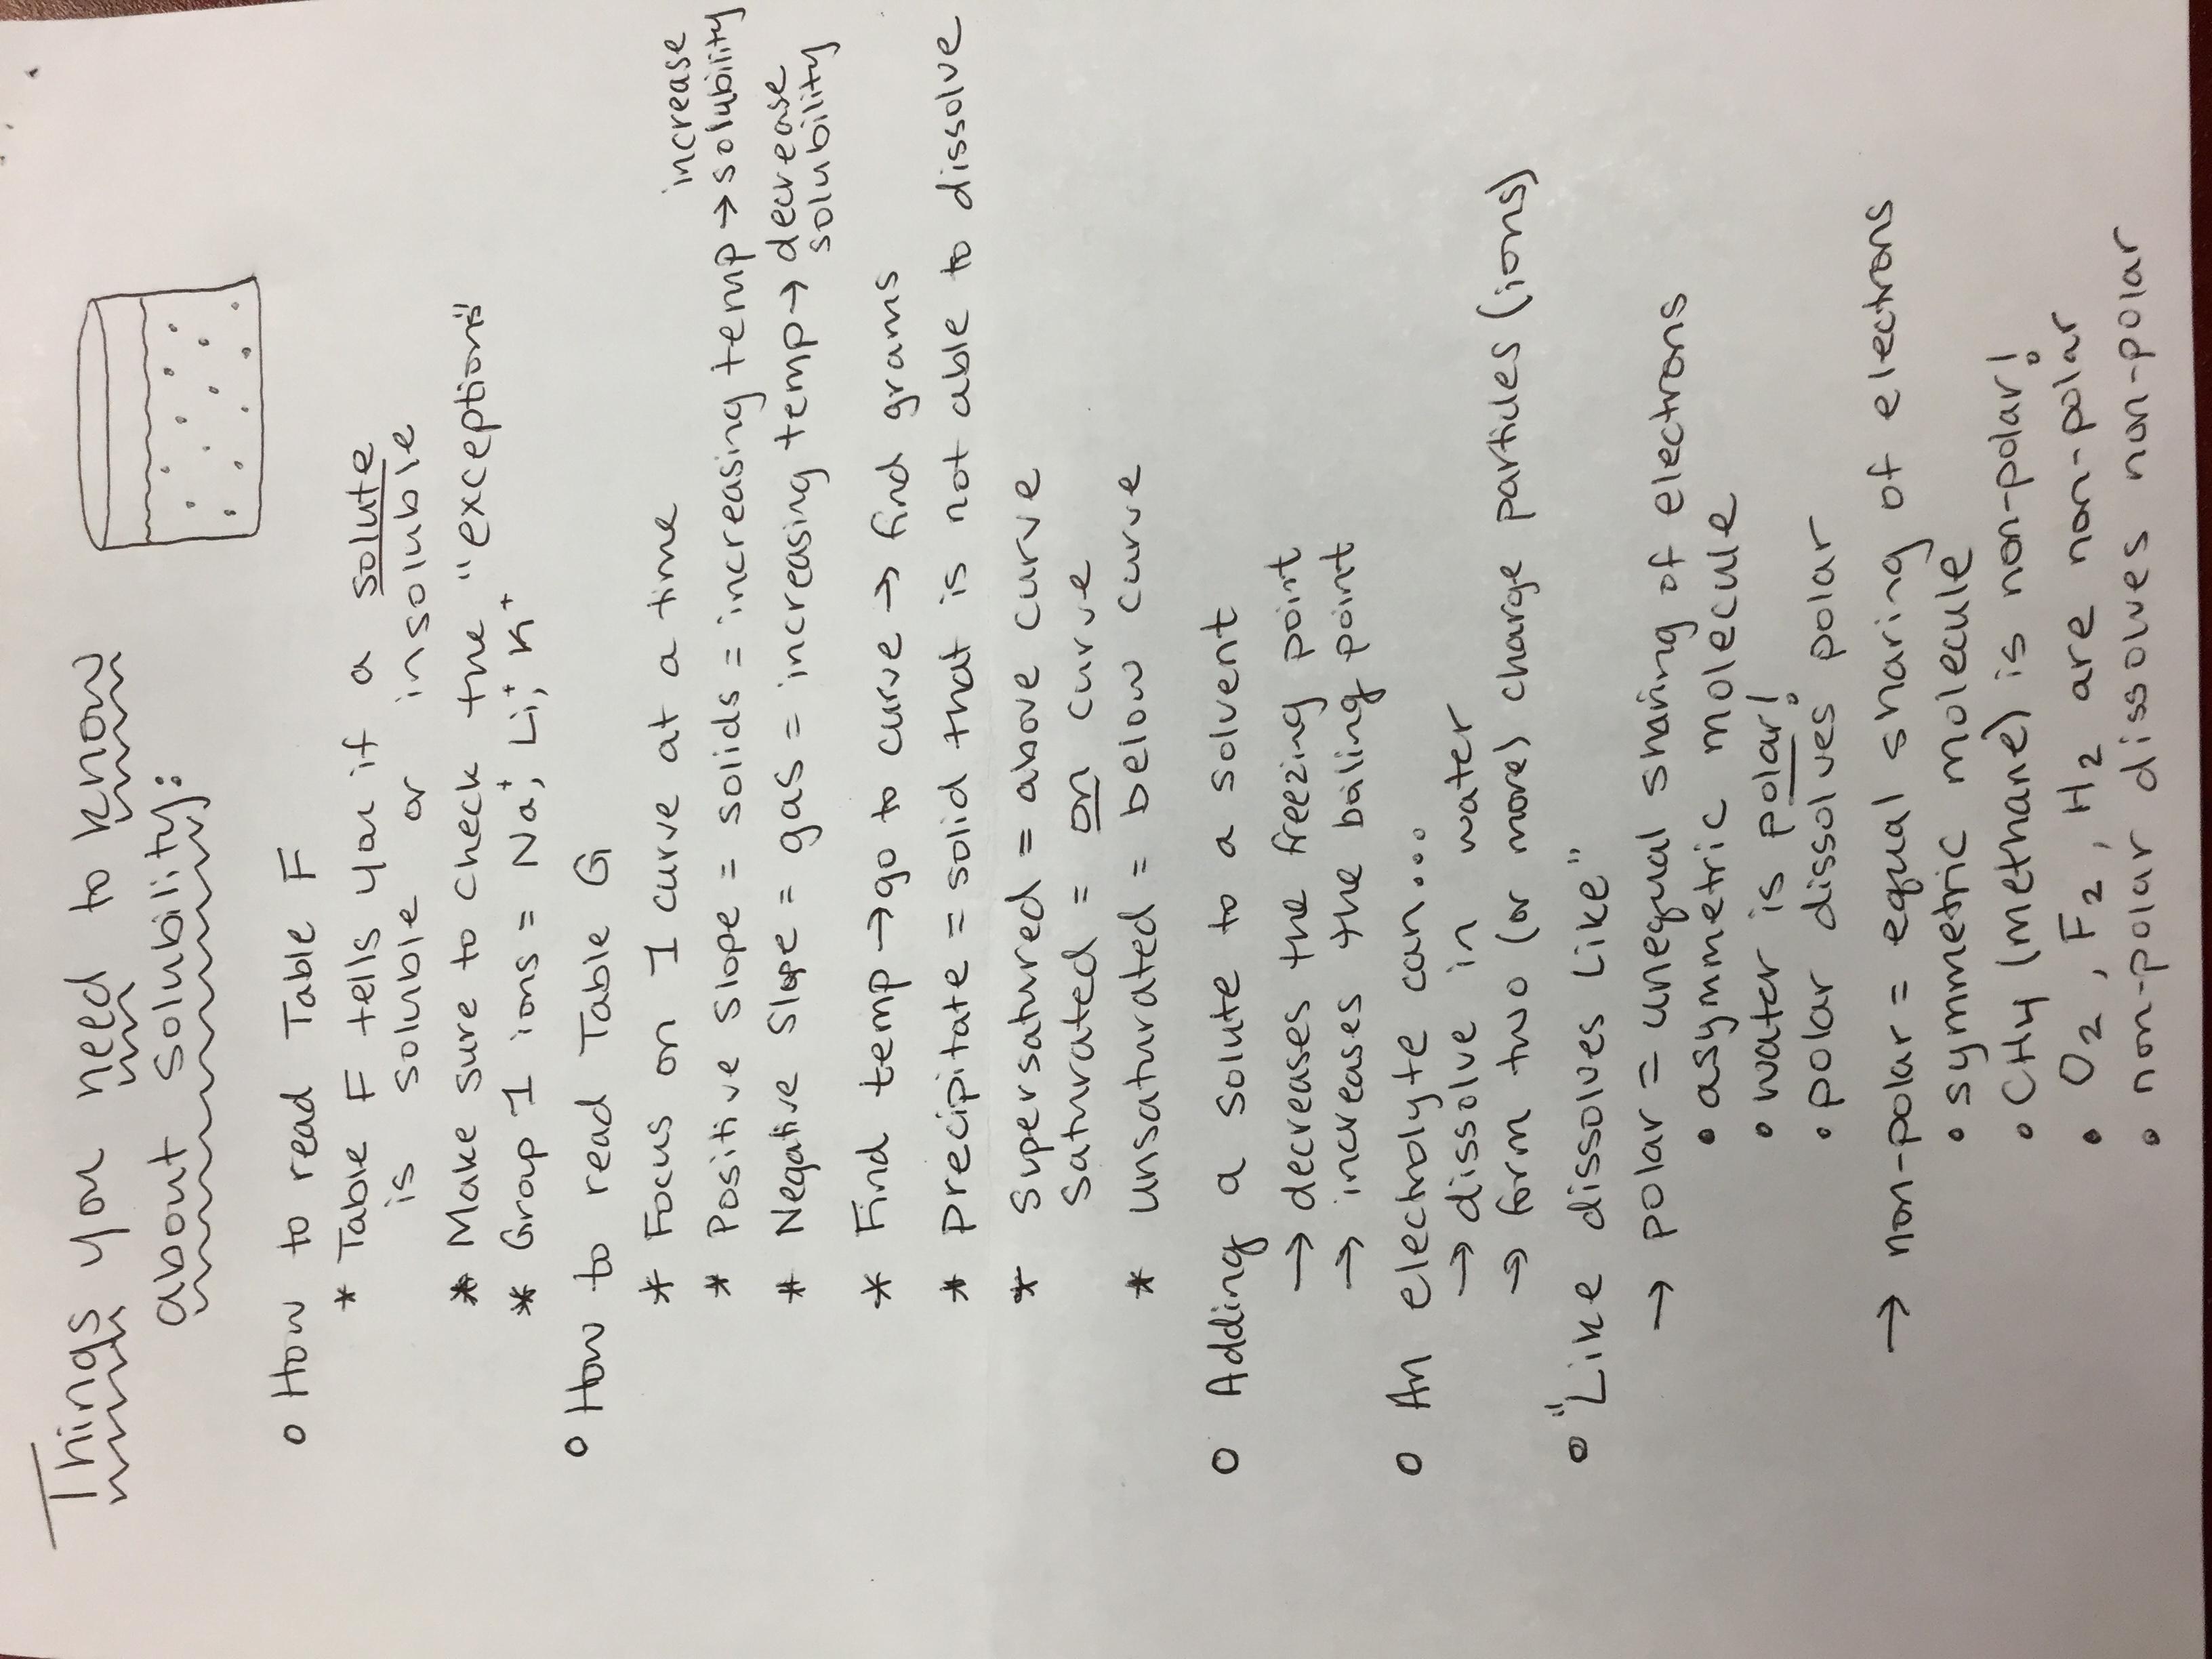 Ms Mac Chemistry